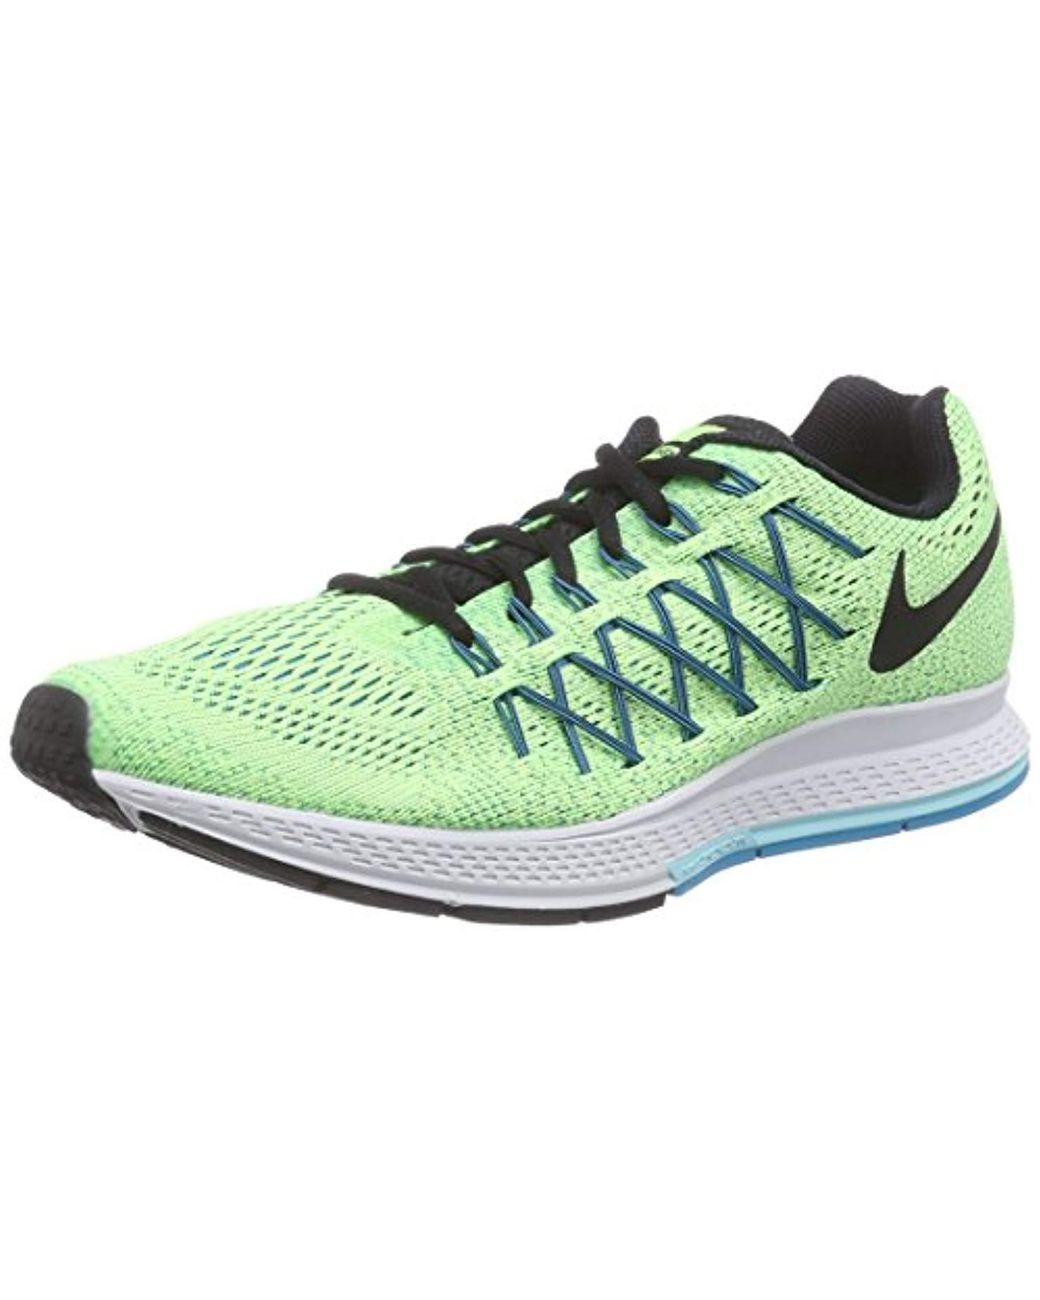 online store f9da7 75314 Nike. Men s Green  s Air Zoom Pegasus 32 Running Shoes